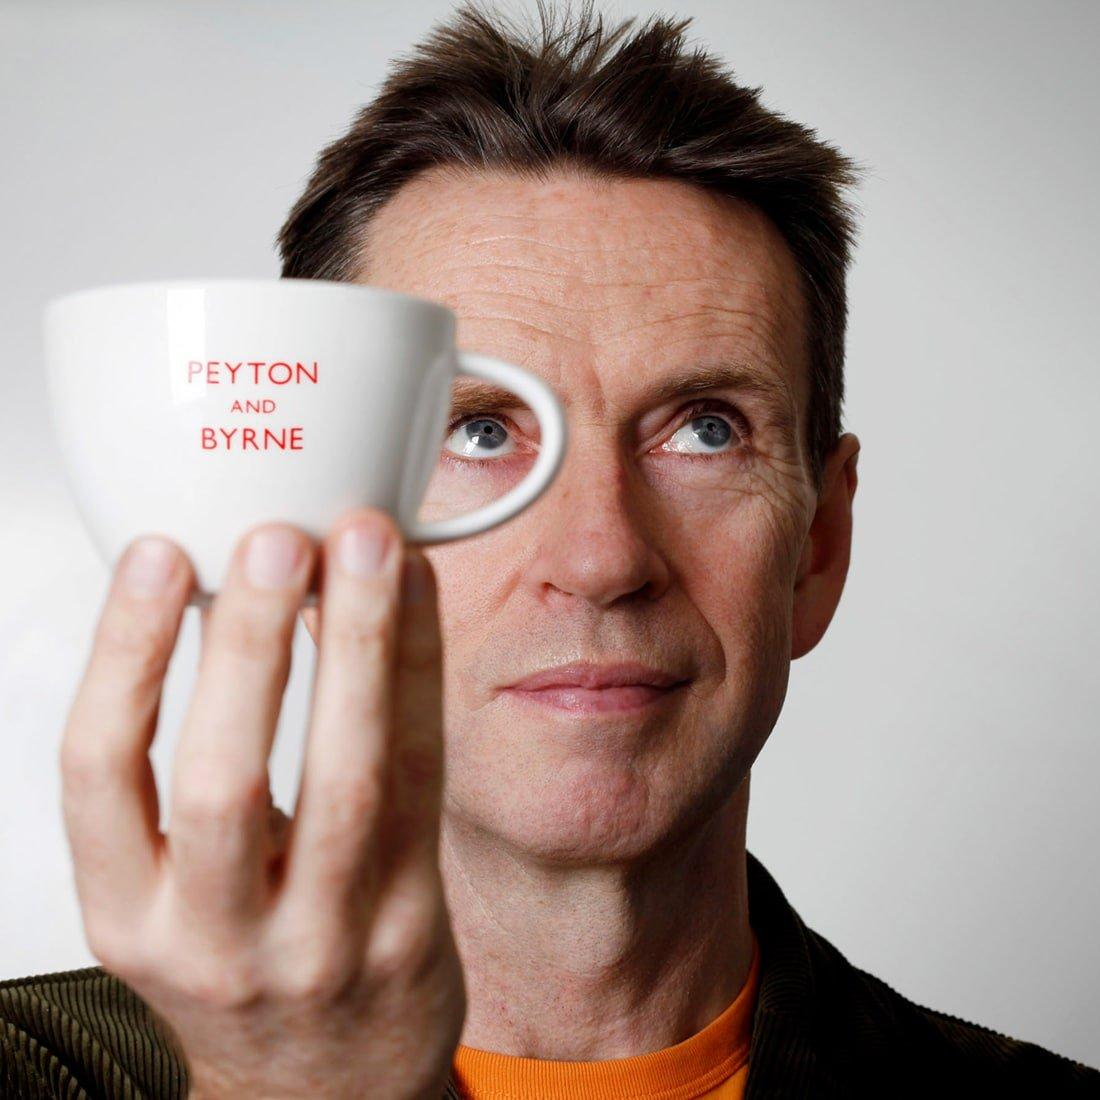 Oliver-Peyton-Restaurantuer-presenter-host-at-Great-British-Speakers